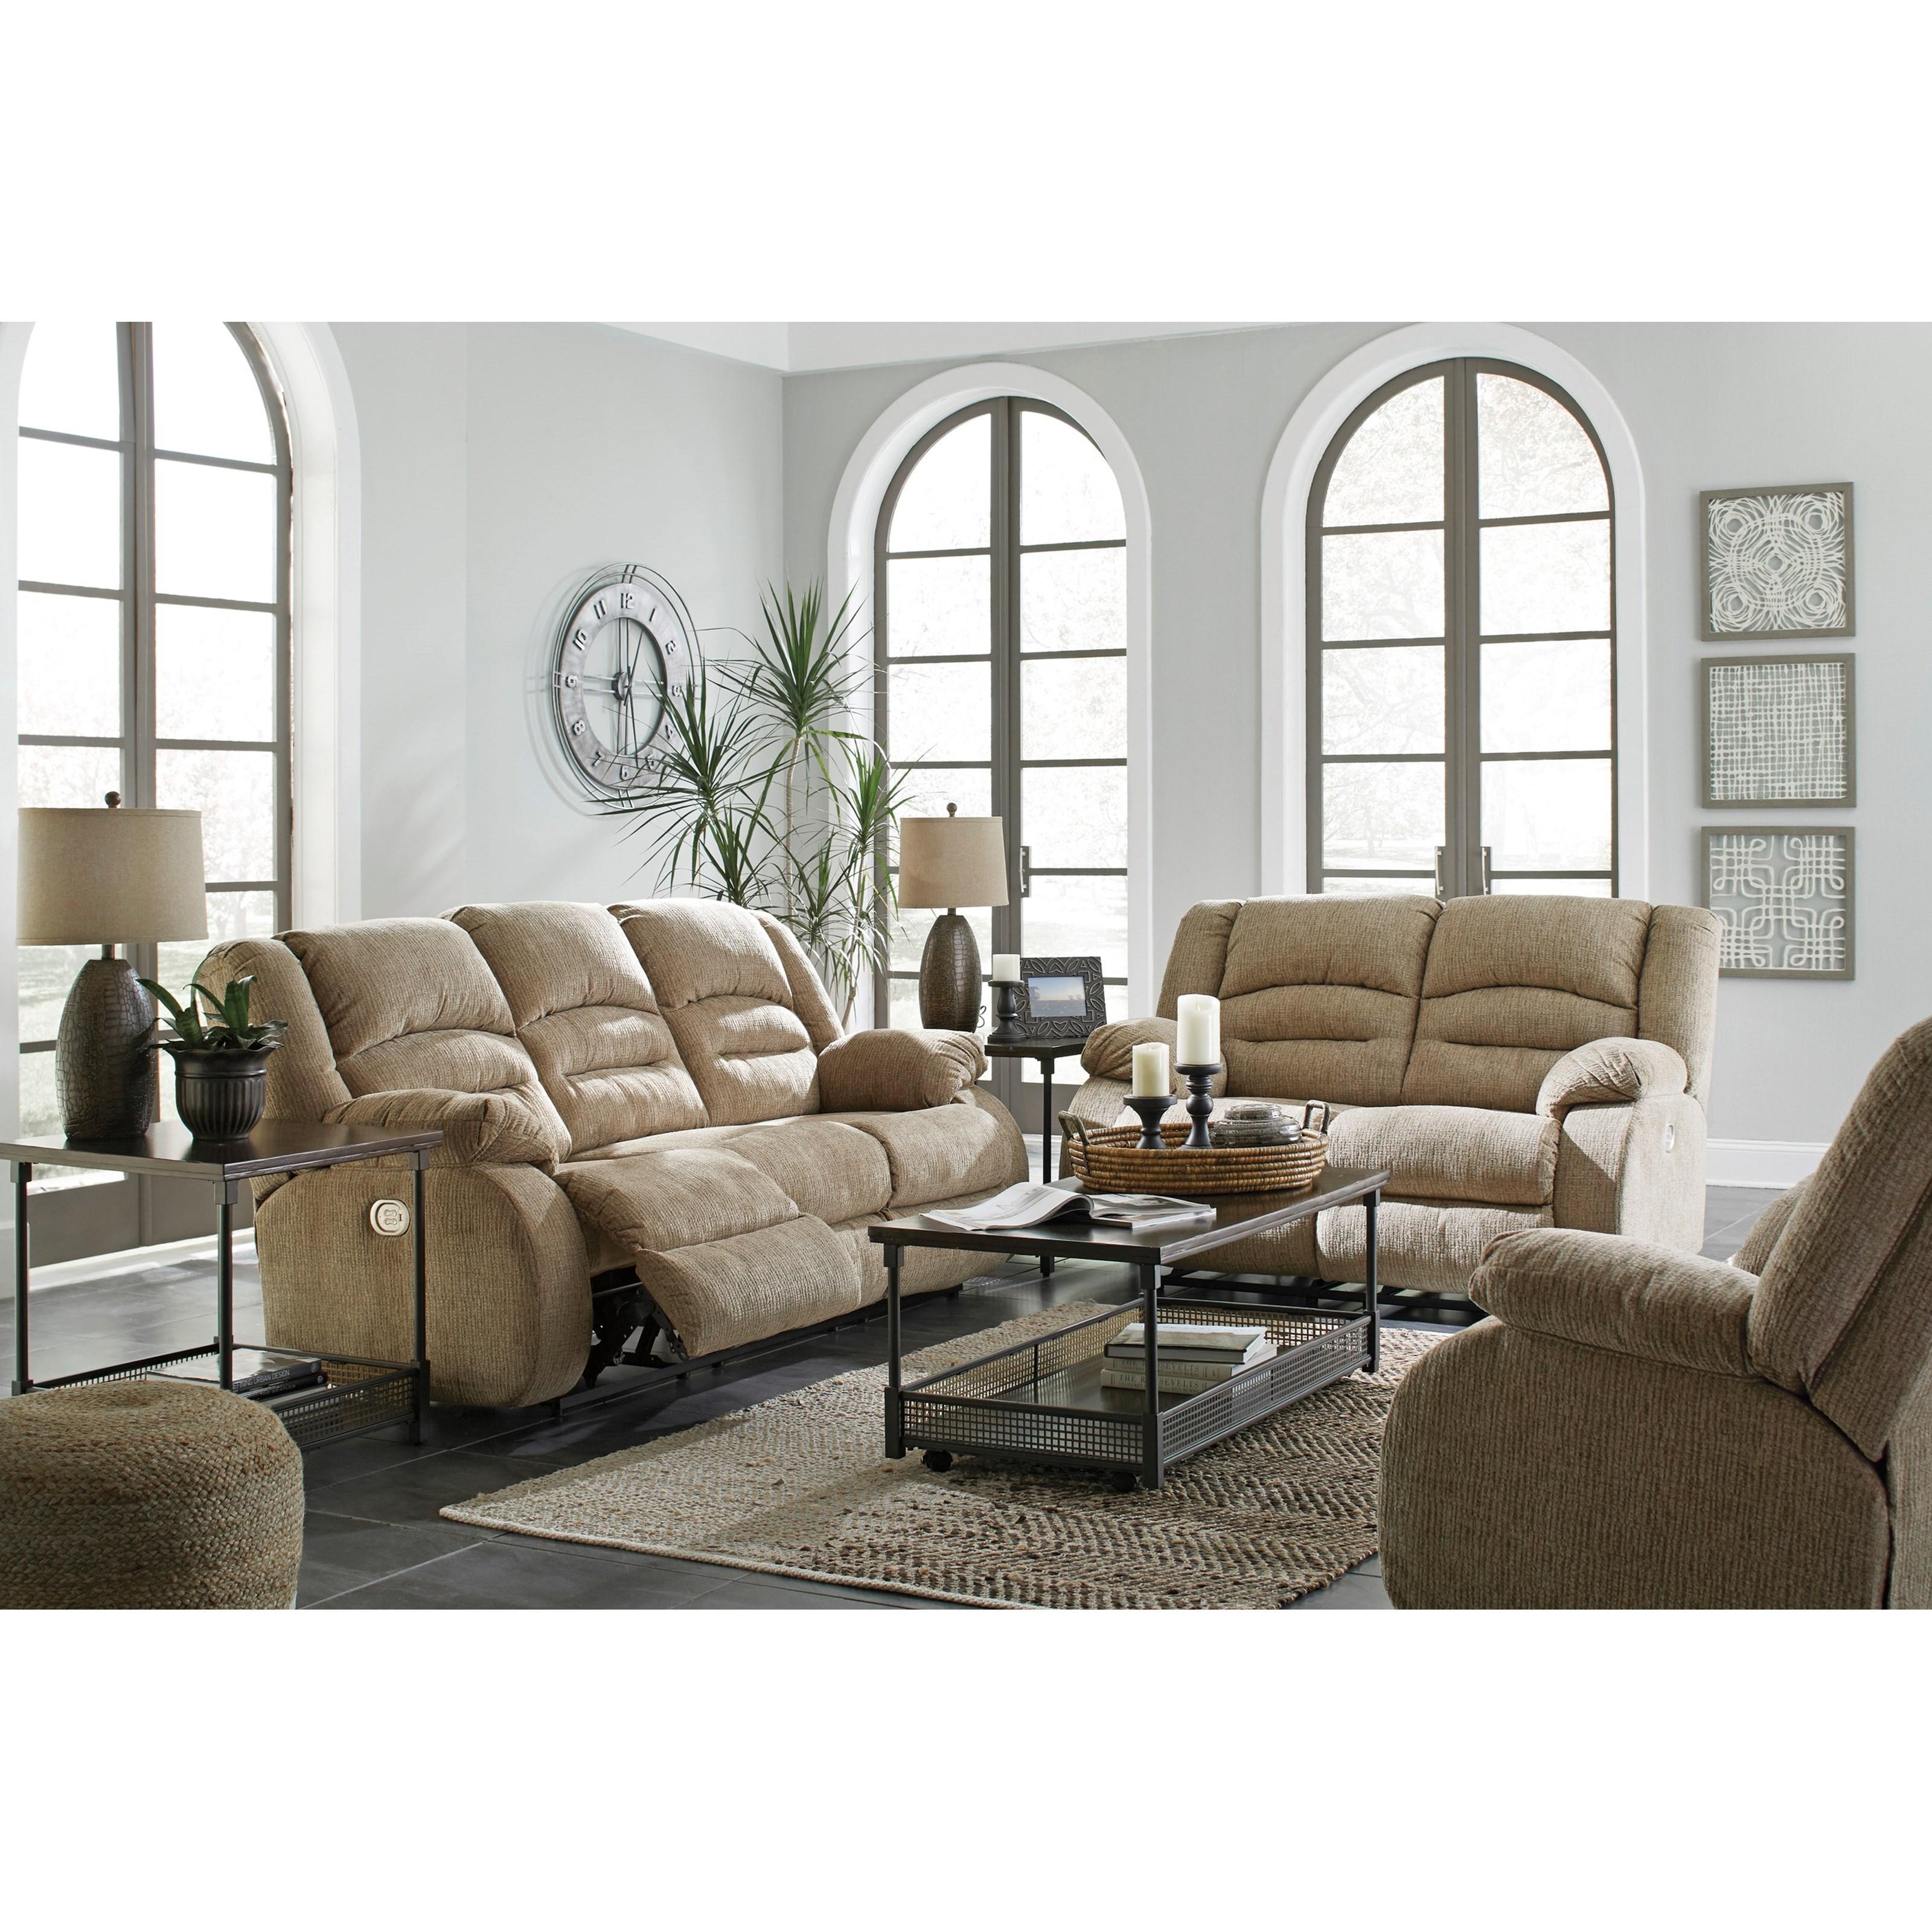 Ashley (Signature Design) Labarre Reclining Living Room Group